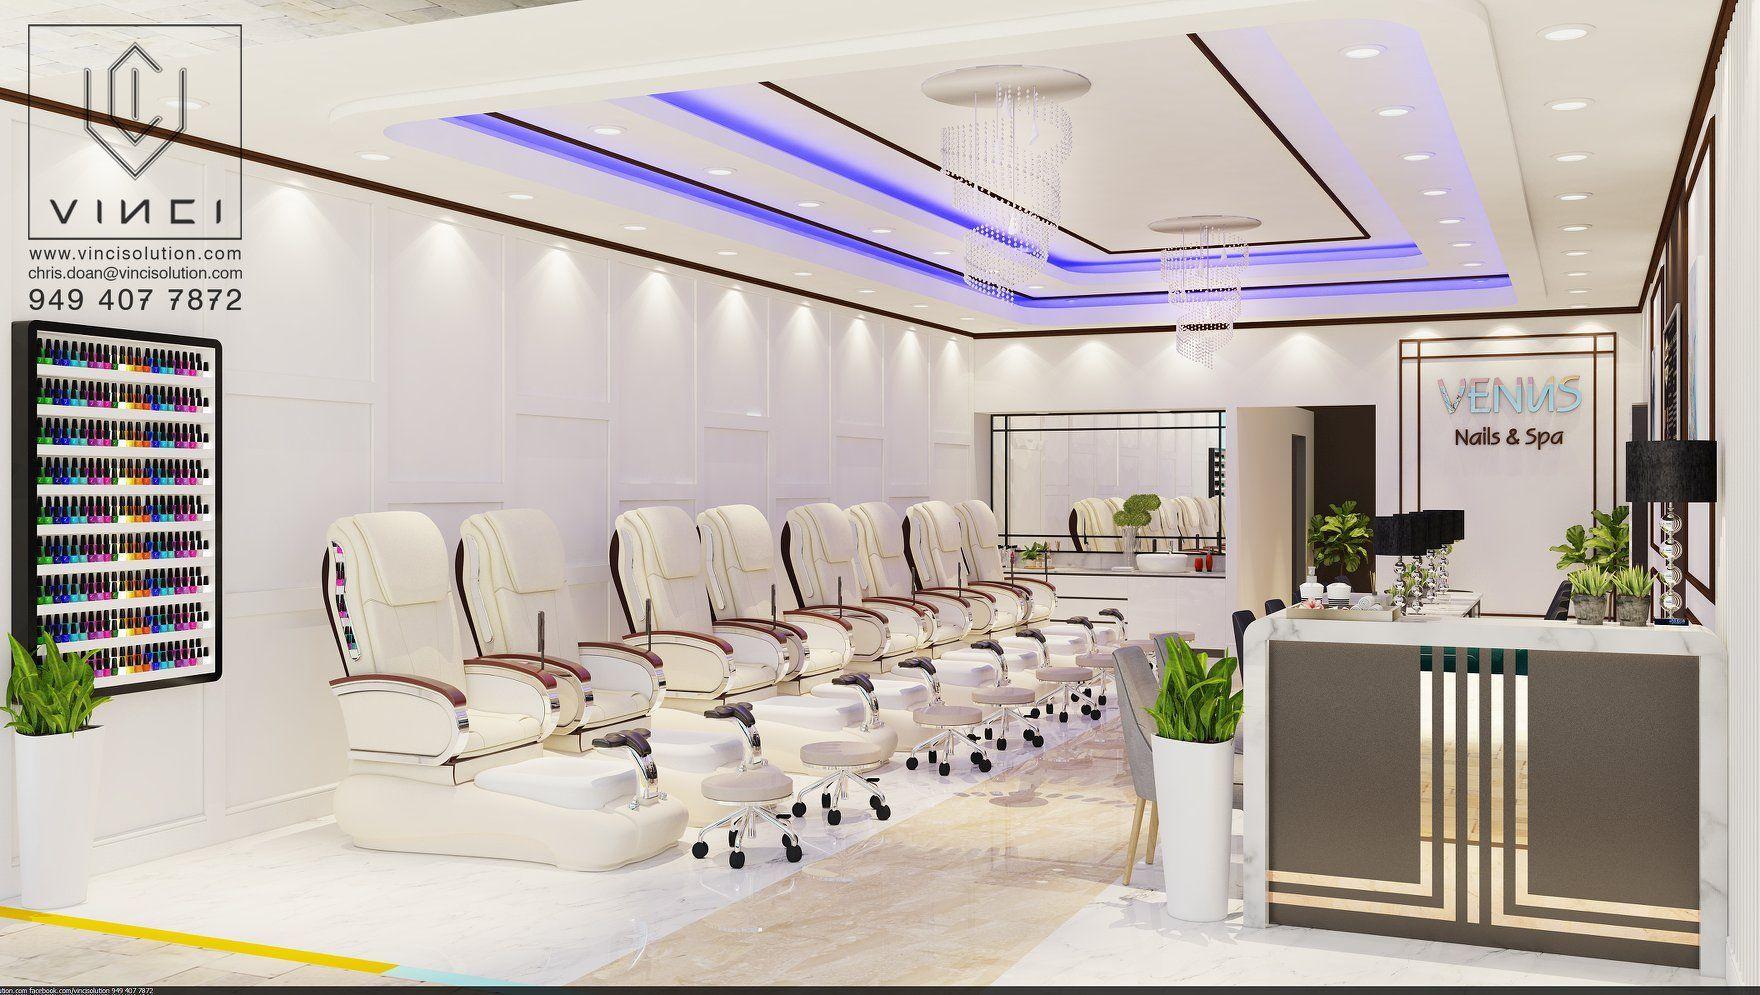 VINCI is a leader company in design & build nails salon in the USA. Most beautiful & luxury nail salon design. Luxurious colors, Cozy interior, Unique design, Impressive, Beautiful. #interiorbusiness #naildesign #salondecor #nailsalondesign #nailsaloninterior #nailsalondecor #beautysalondesign #saloncolor #nailsaloninteriordesign #topnailssalondesigninusa #bestnailsalondesign #luxurynailssalon #nailsalondesigninusa #beautifulnailssalon #modernnailsalon